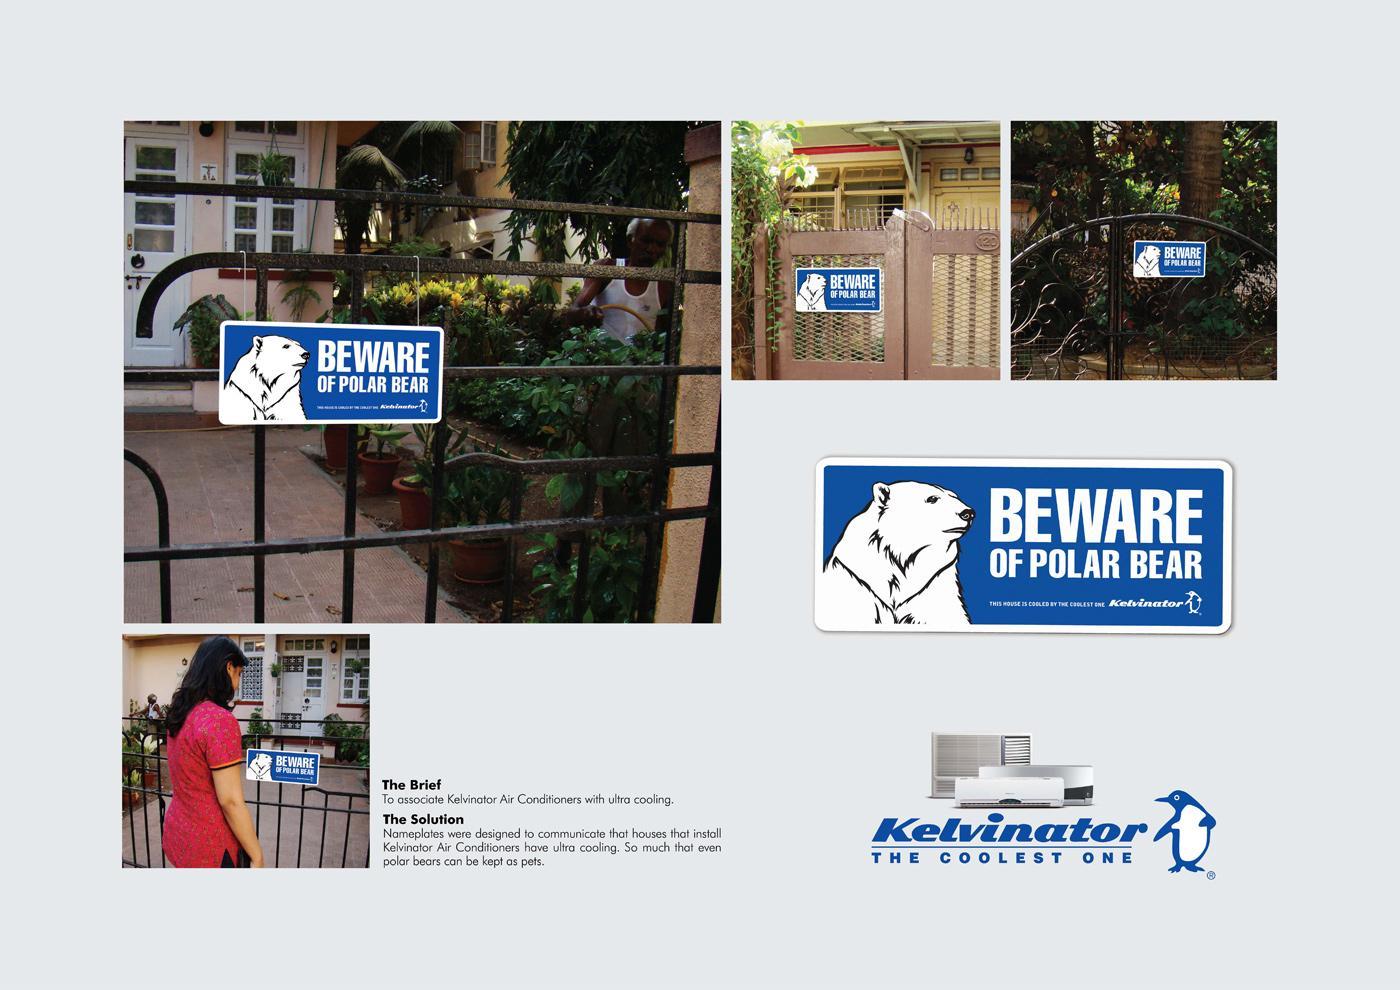 Kelvinator Ambient Ad -  Beware of Polar Bear